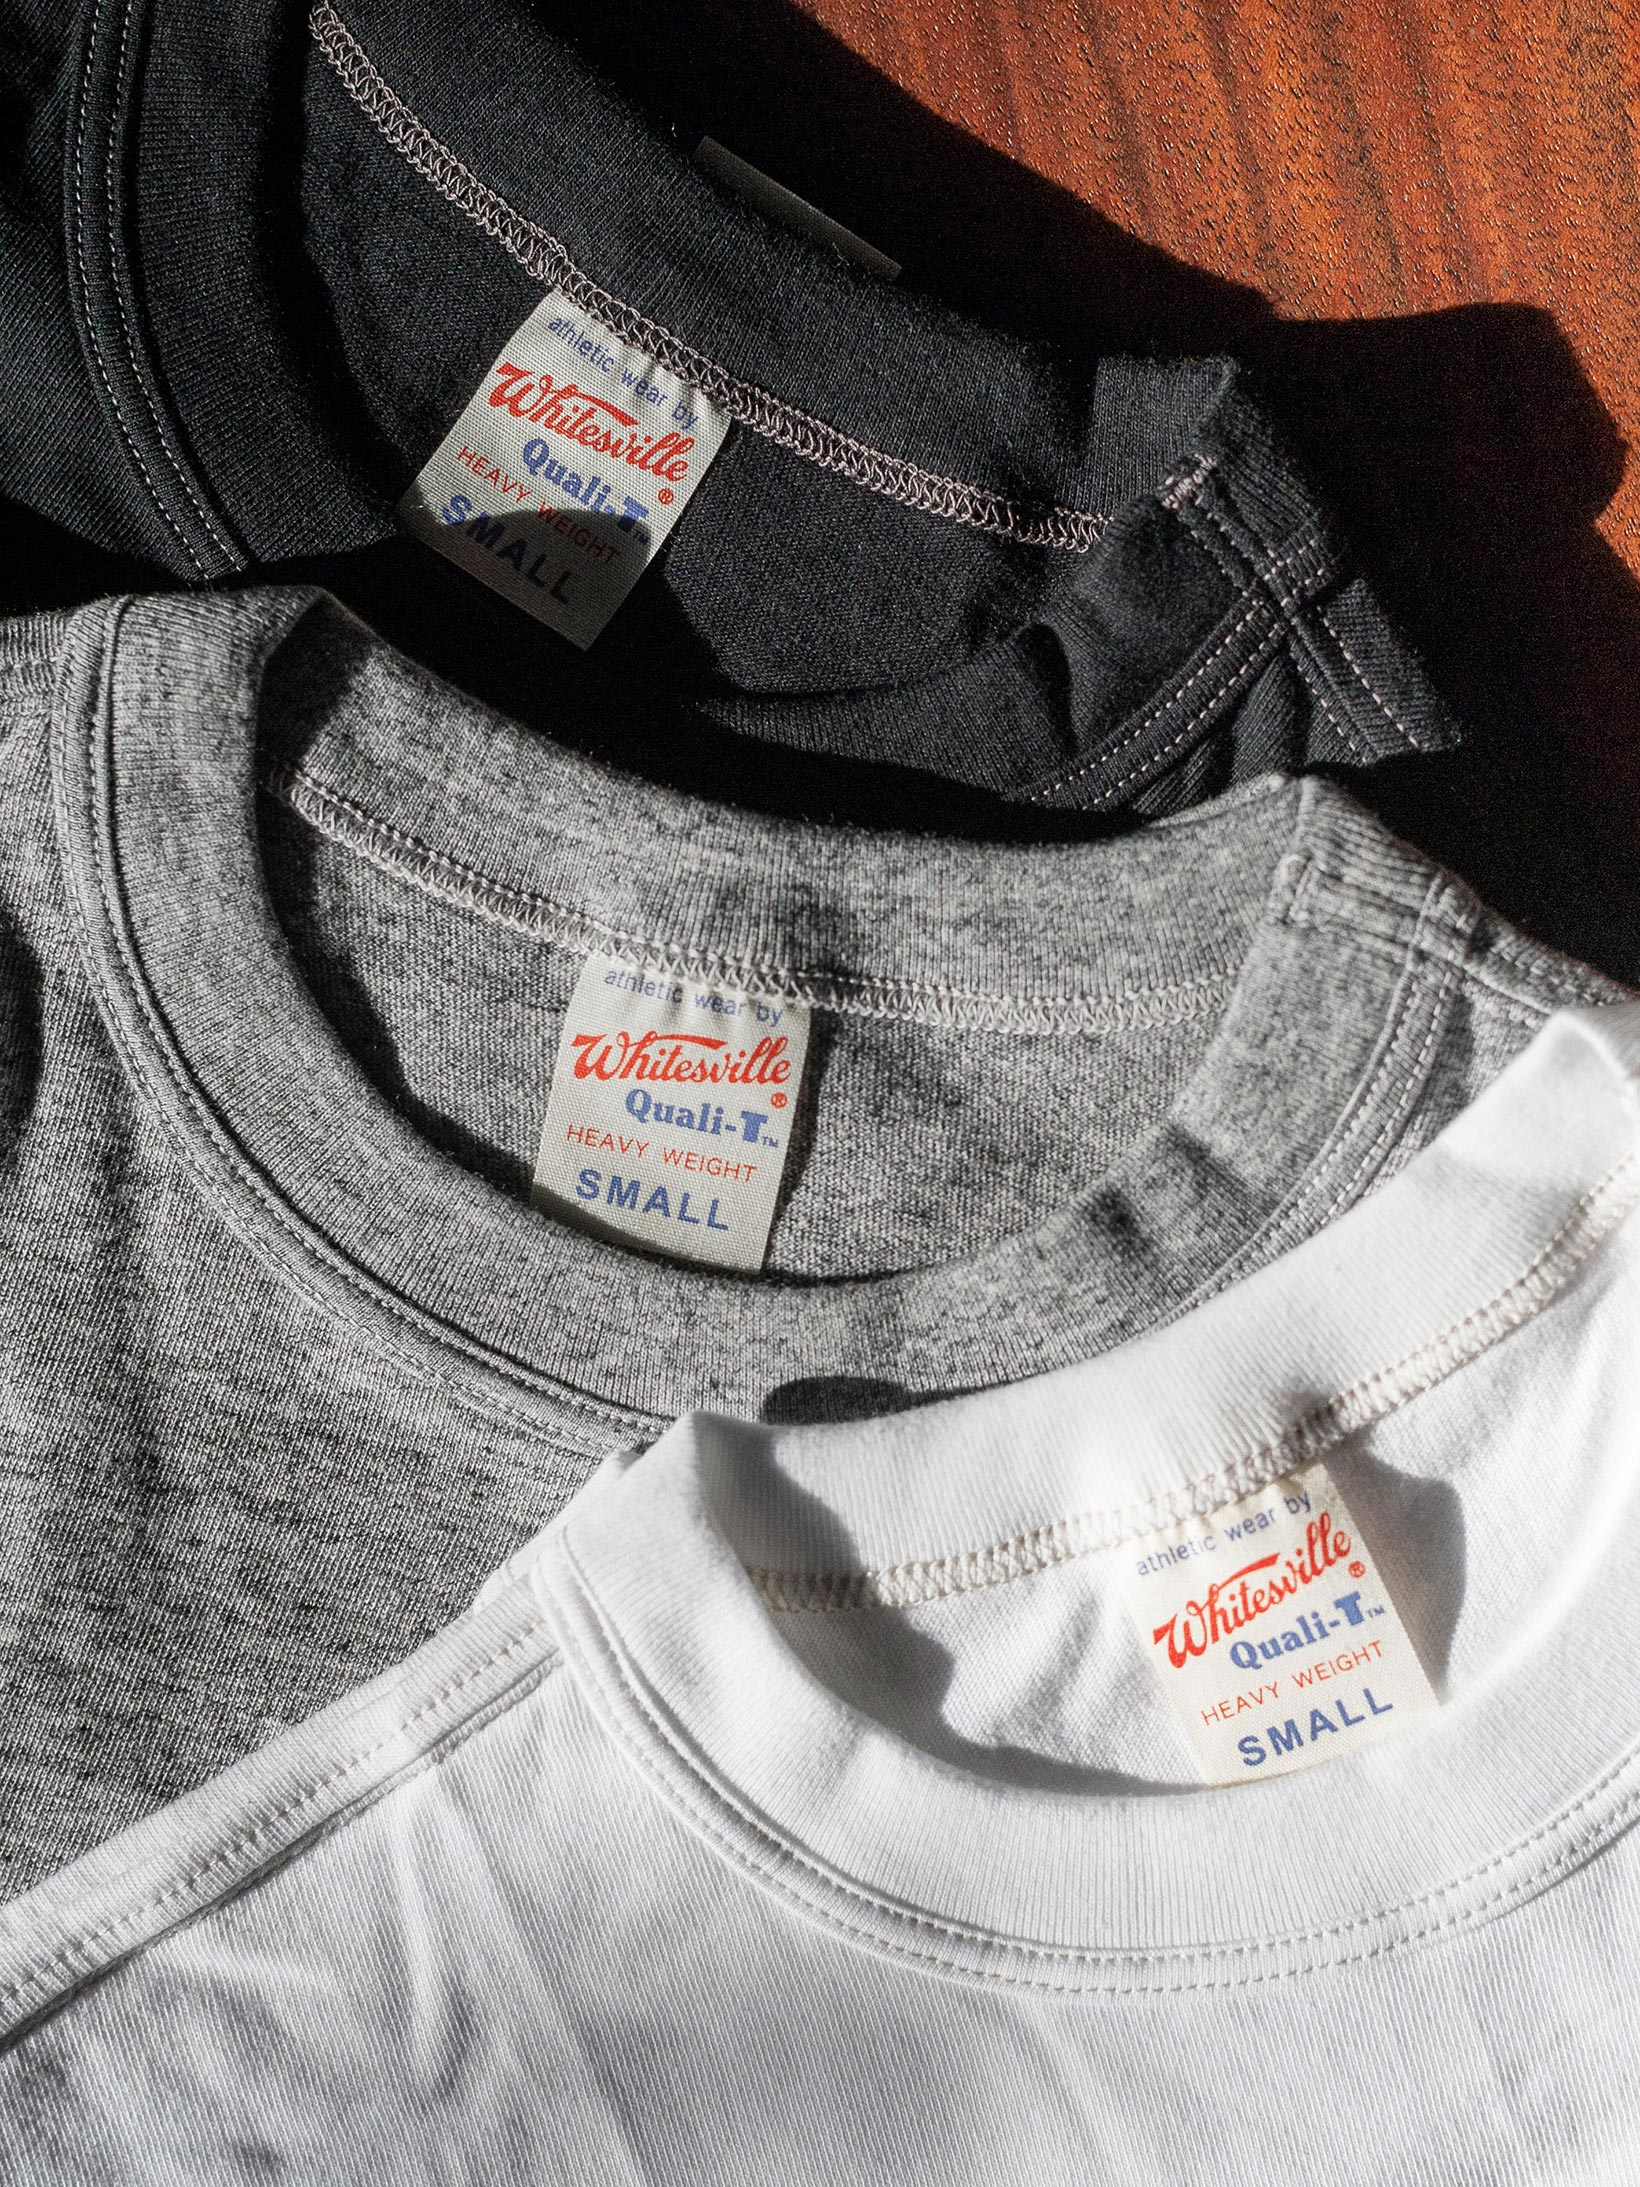 Whitesville Japanese Made T-Shirts - White (2-Pack) - Image 9